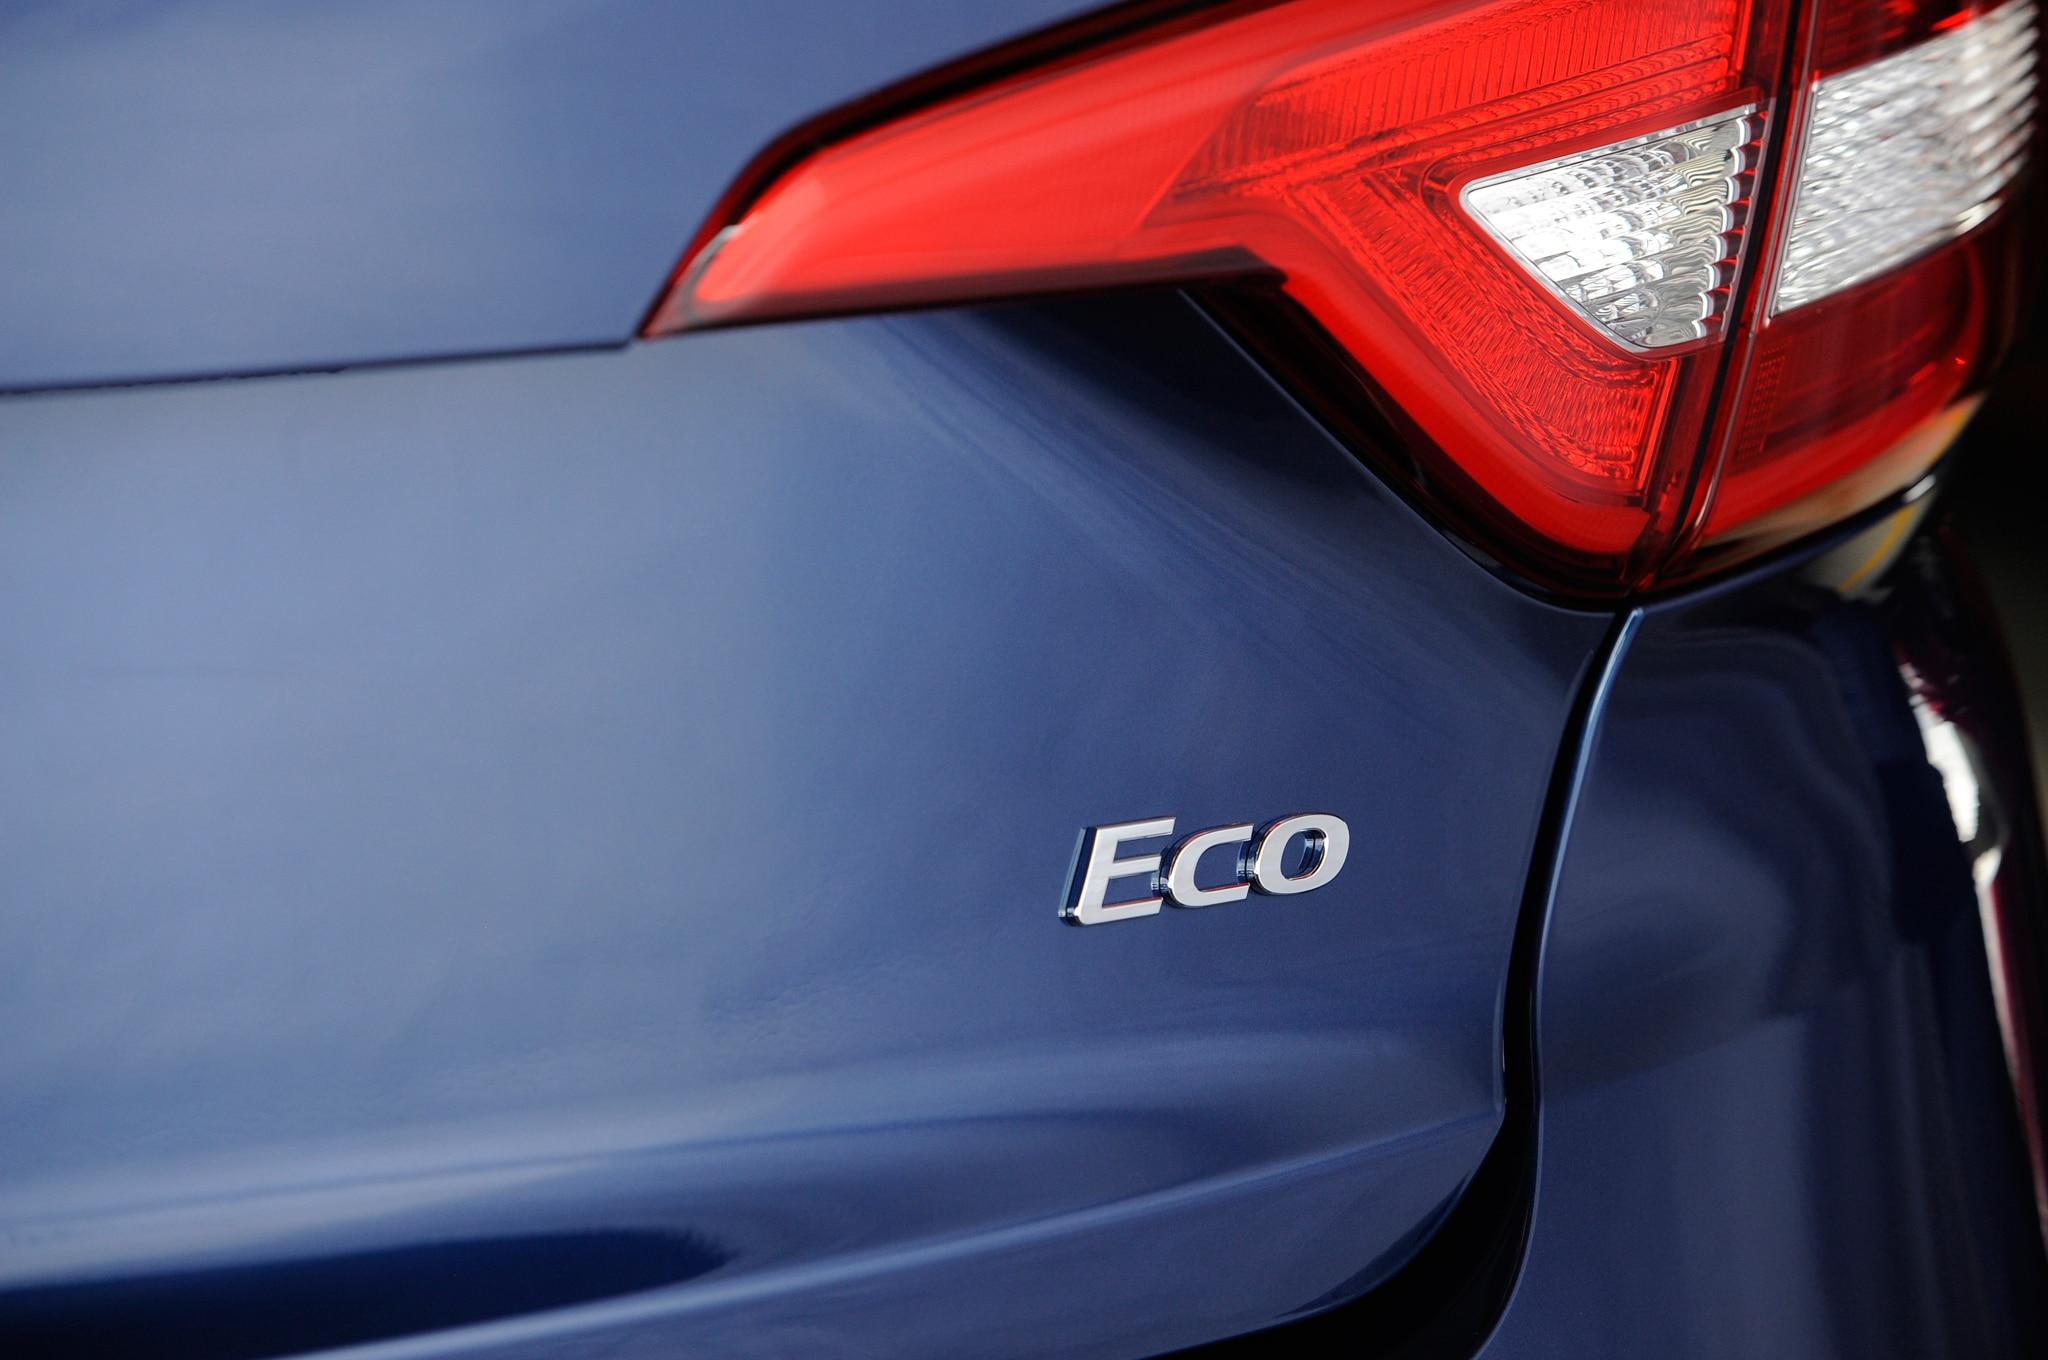 2015 hyundai sonata pricing options and specifications cleanmpg - 2015 Hyundai Sonata Eco Badge